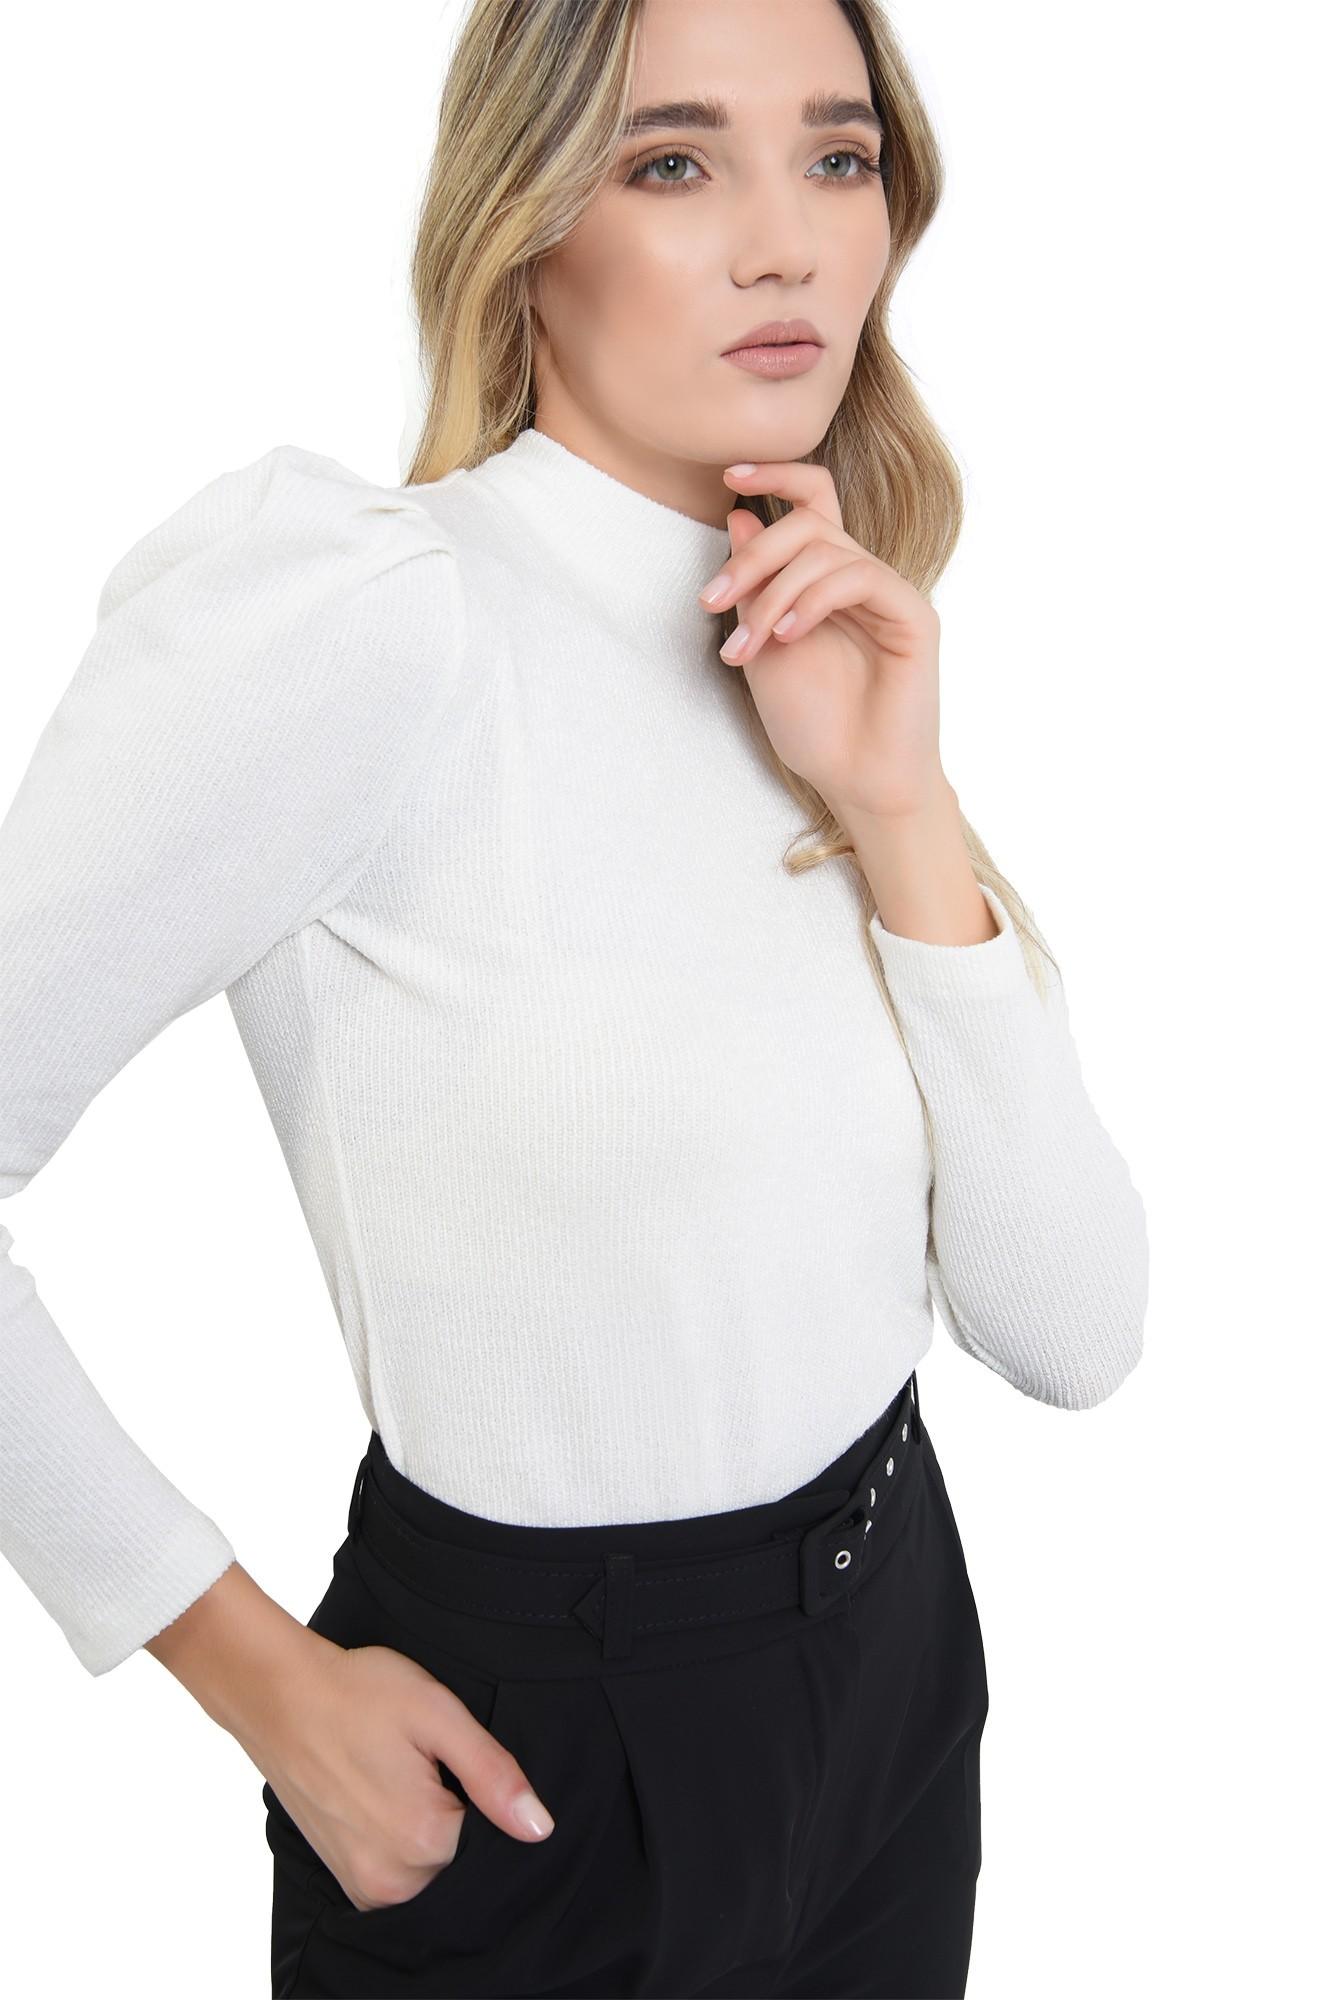 pulover cu umeri accentuati, tricotat, alb, cu maneca lunga